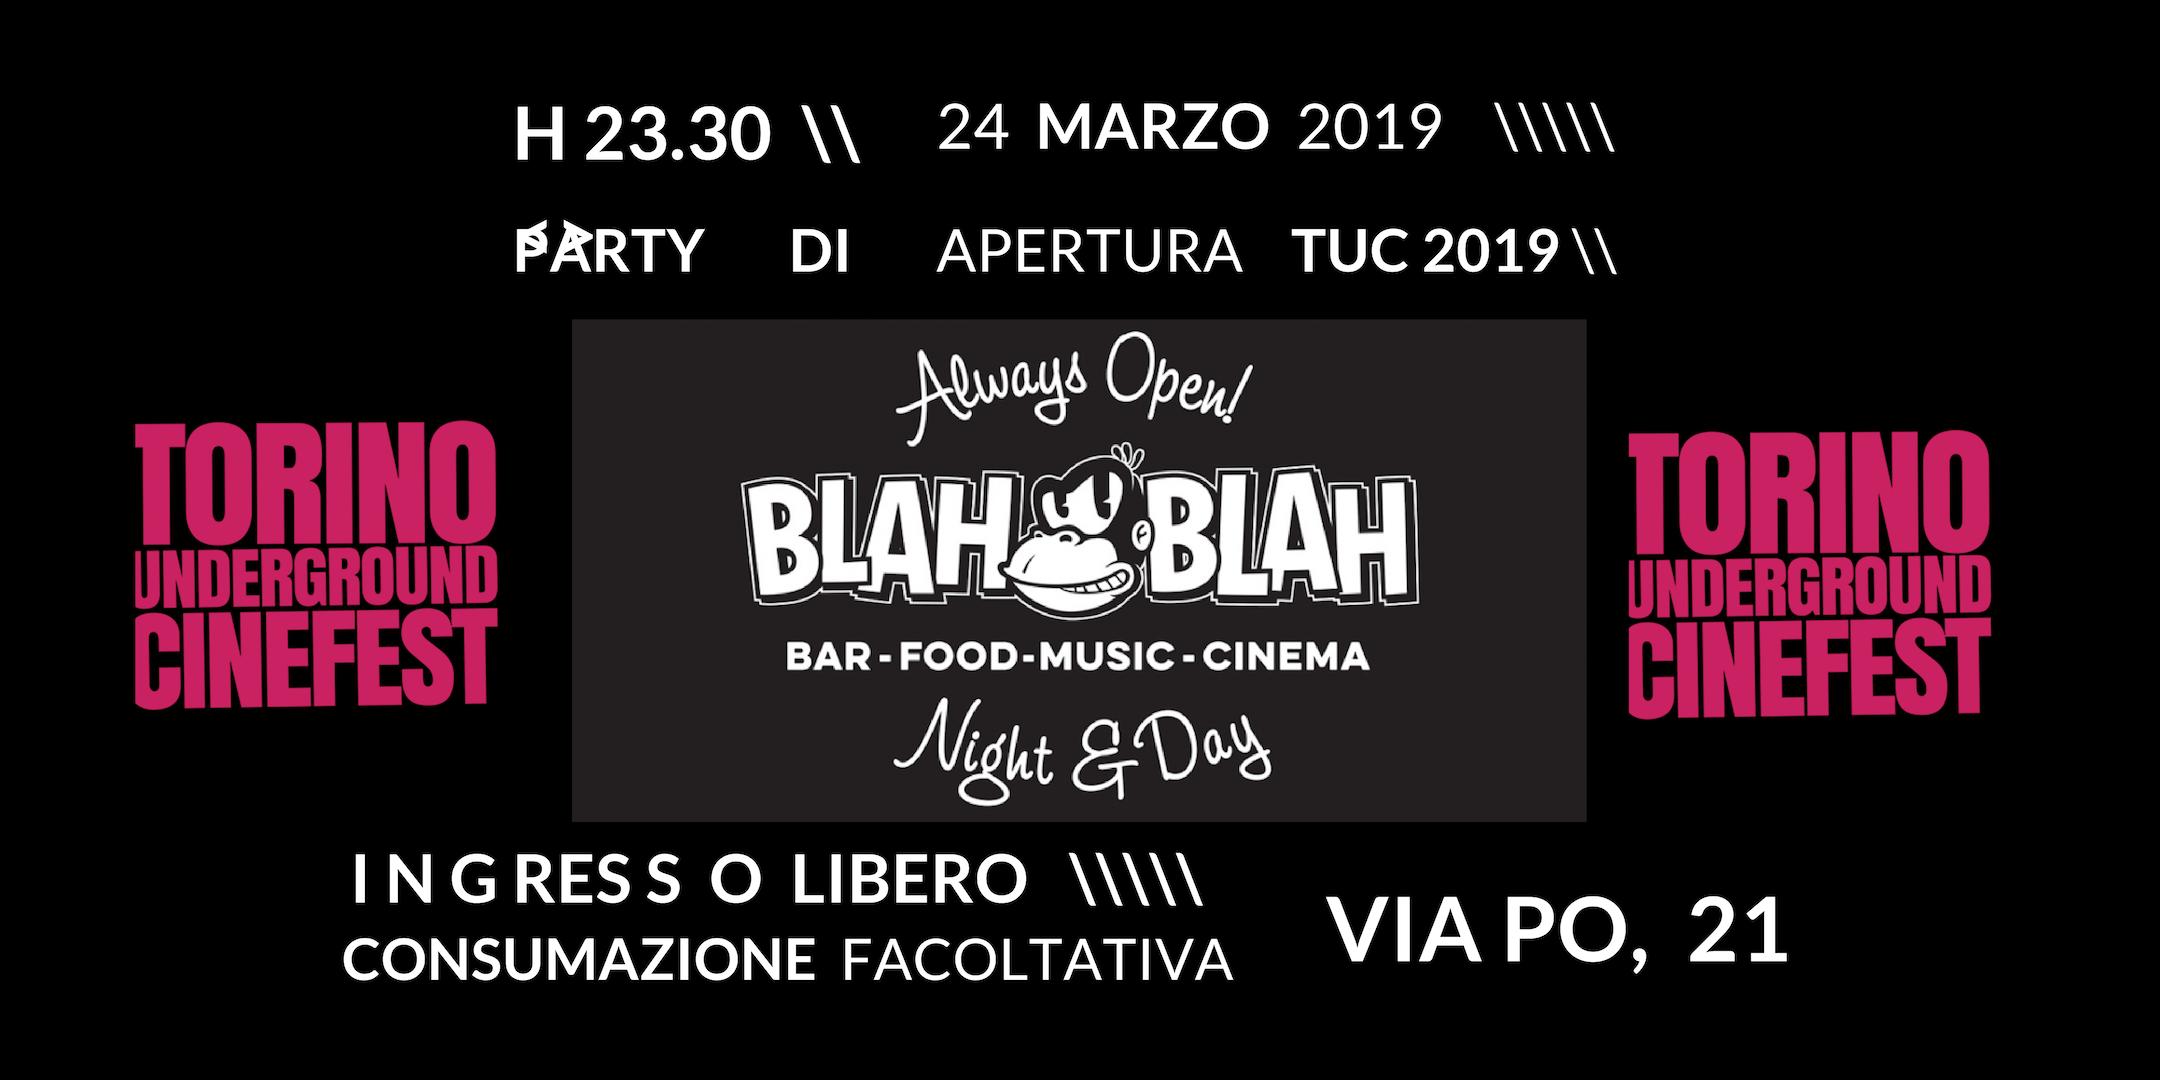 6° Torino Underground Cinefest - Party di ape